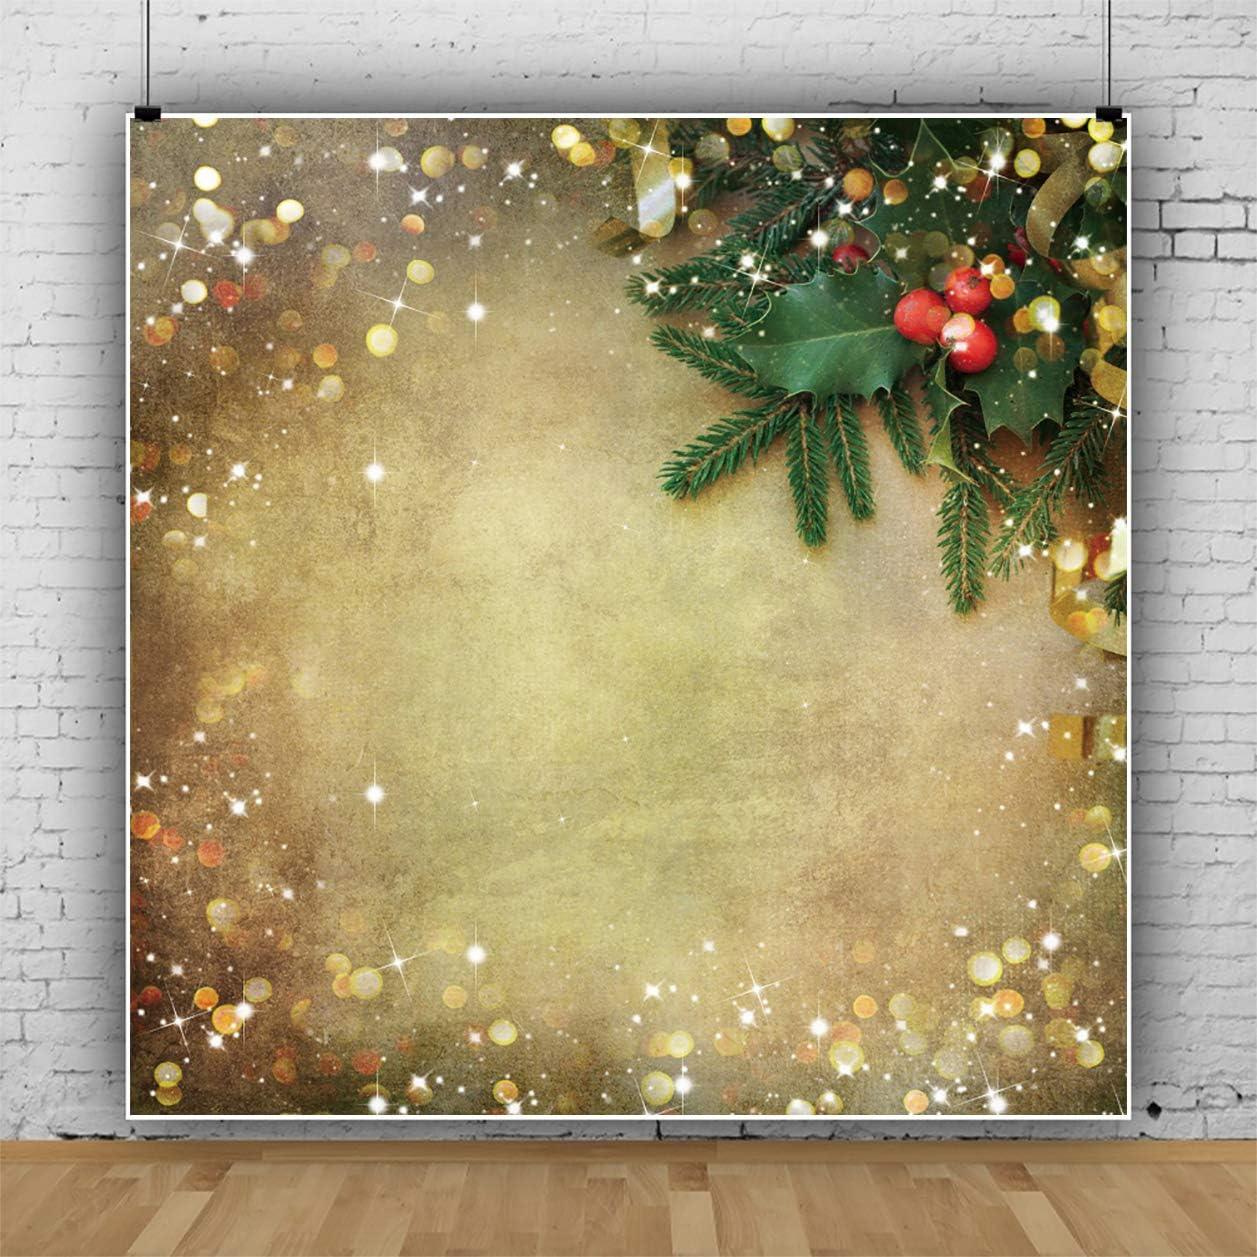 Haoyiyi 10x8ft Sparkly Glitter Christmas Backgrounds Xmas Tree Lights Golden Spots Shinning Sparkle Bokeh Spots Glitter Backdrop Photography Baby Wedding Home Garden Photo Decoration